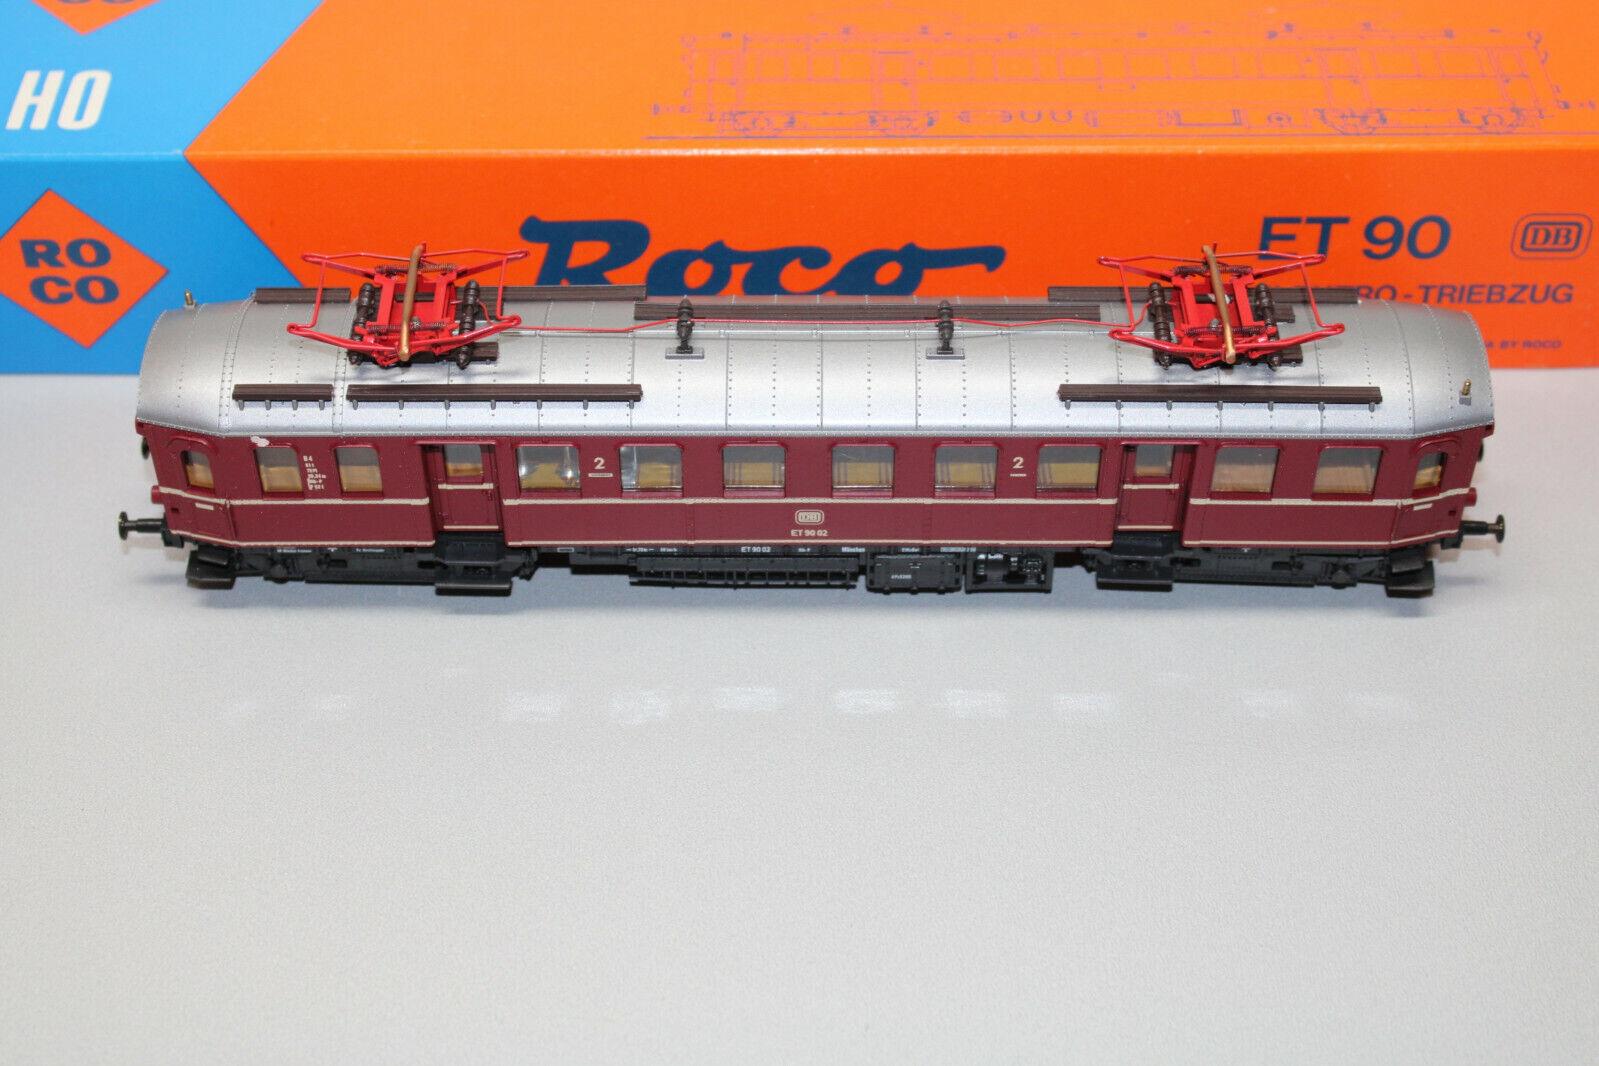 Roco 04185a elektrojoriebzug et90 DB Spur h0 OVP